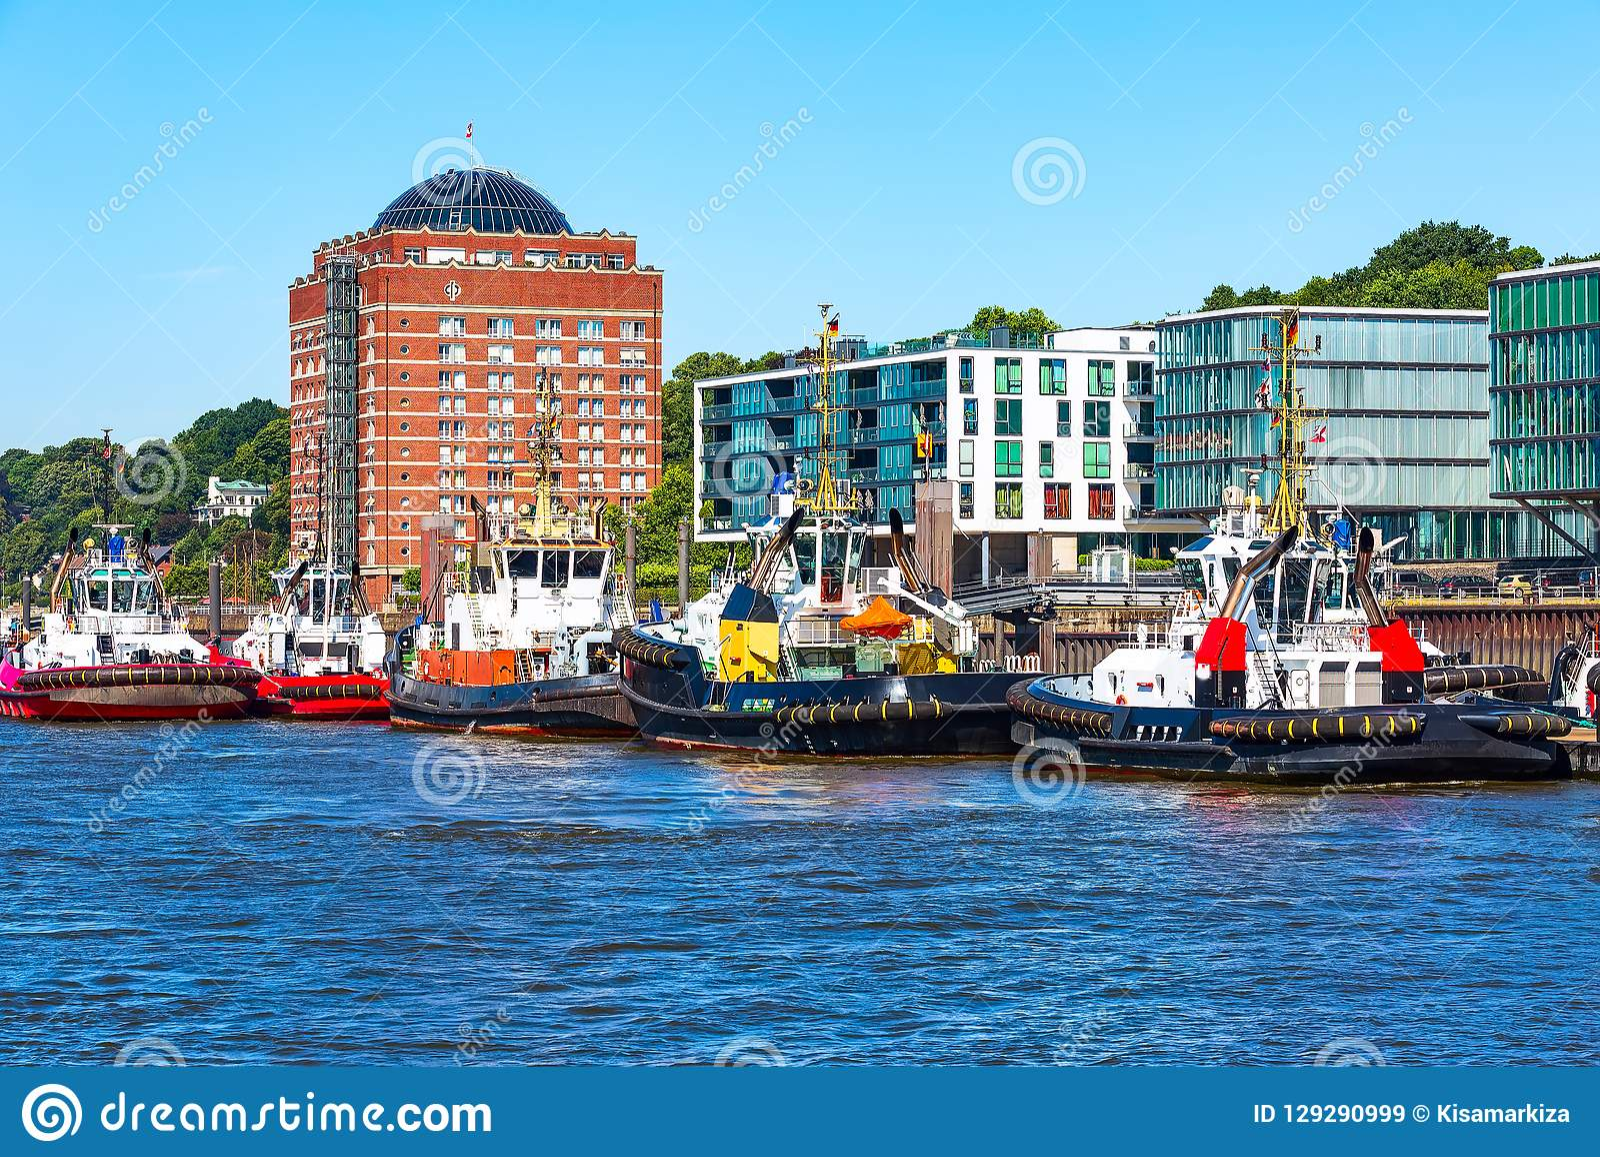 Germany, Hamburg skyline and river Elbe